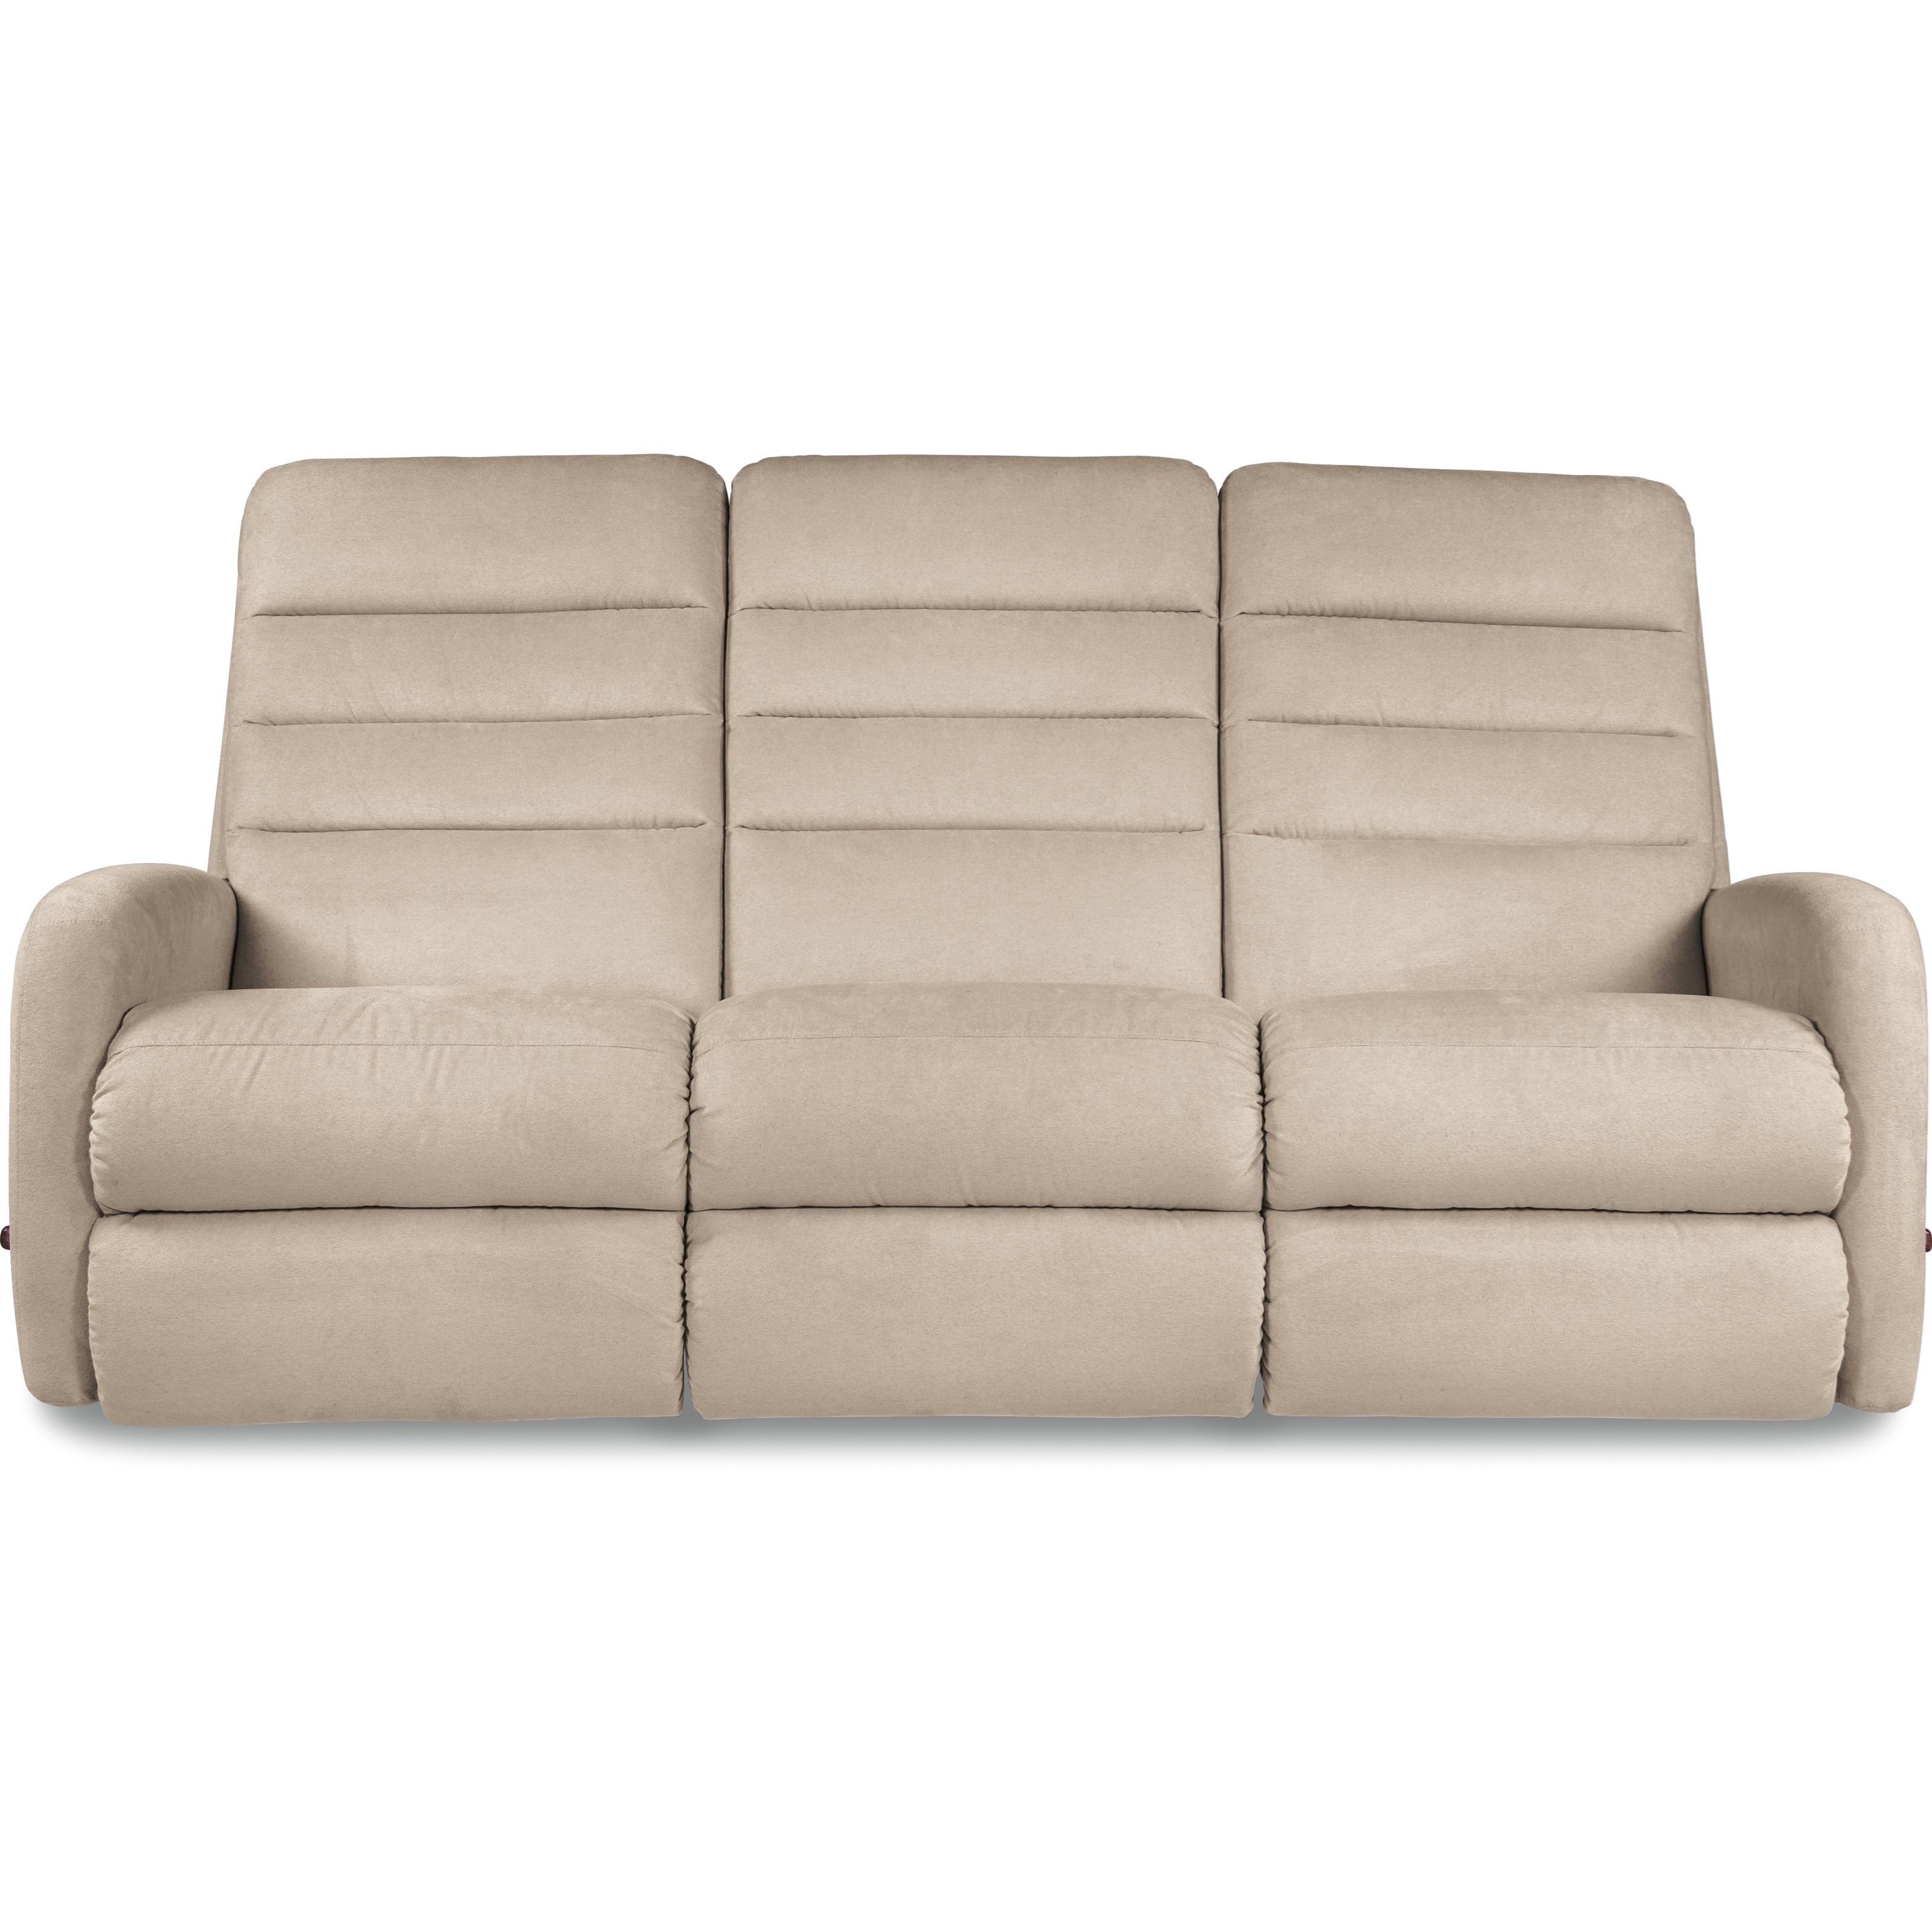 Attrayant La Z Boy Forum 330744 Contemporary Reclining Sofa | Great American Home  Store | Reclining Sofas